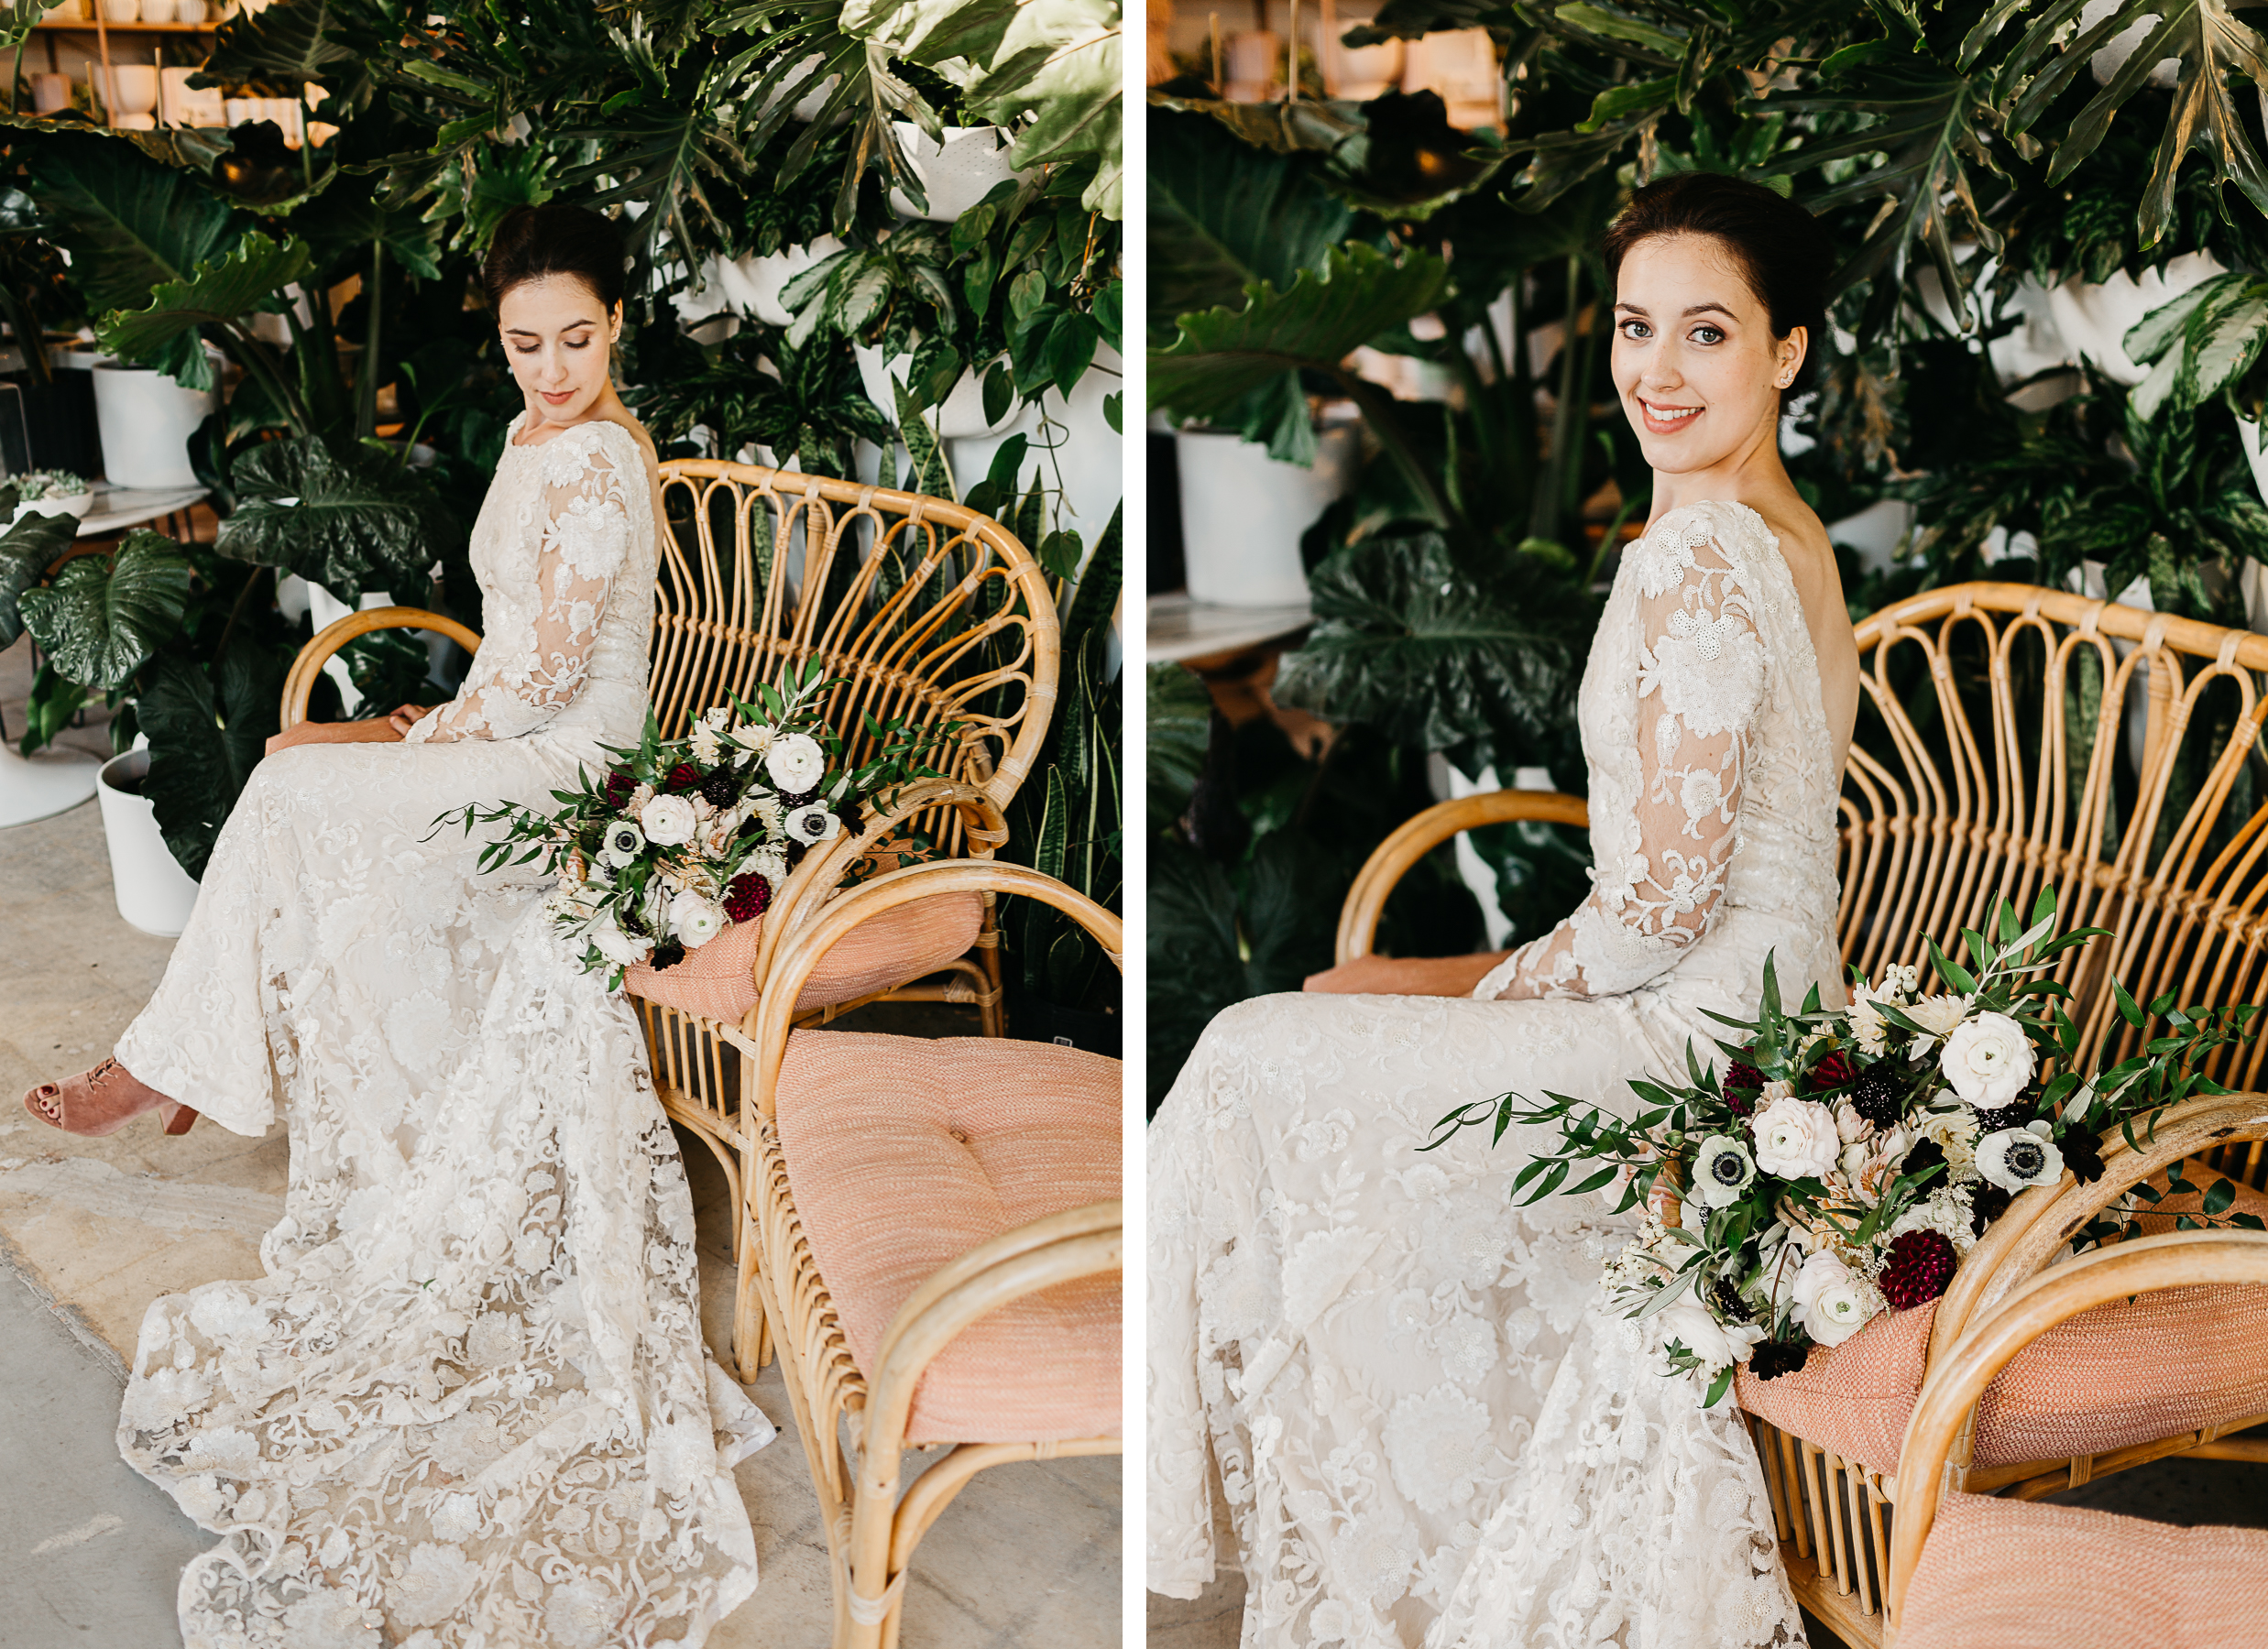 austin wedding photographer 19.jpg